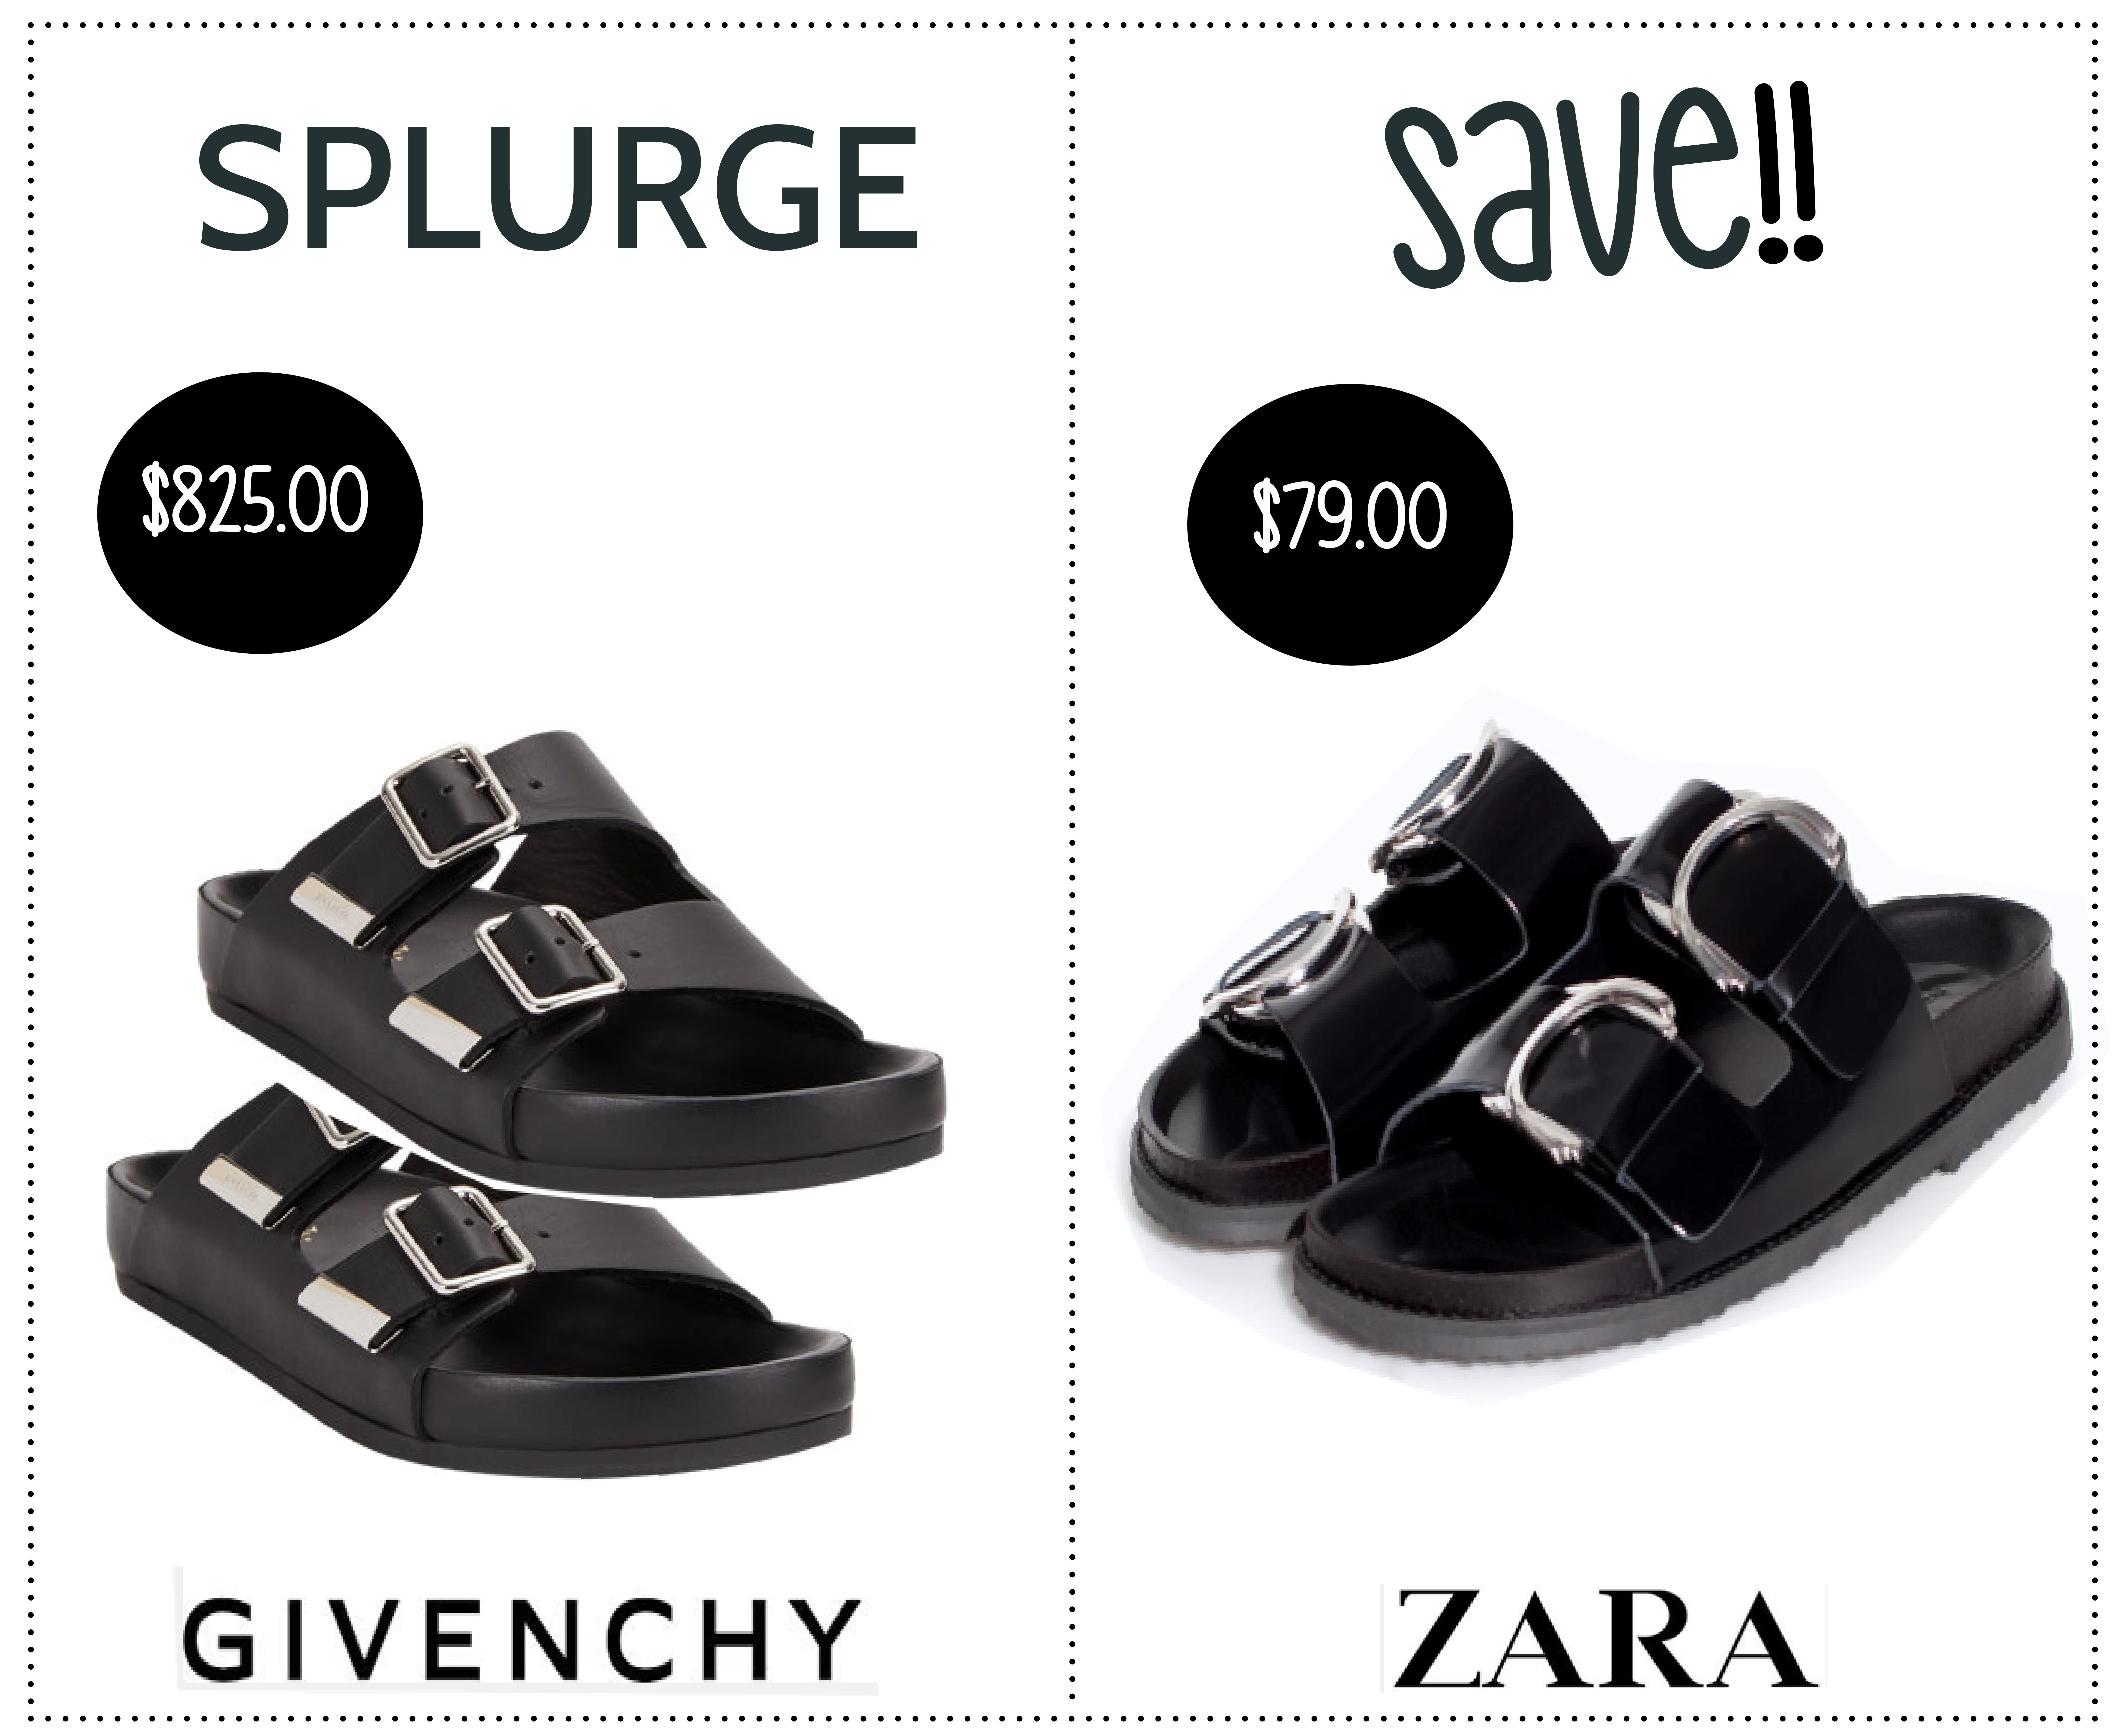 Splurge Or Save Givenchy Double Strap Sandals Vs Zara